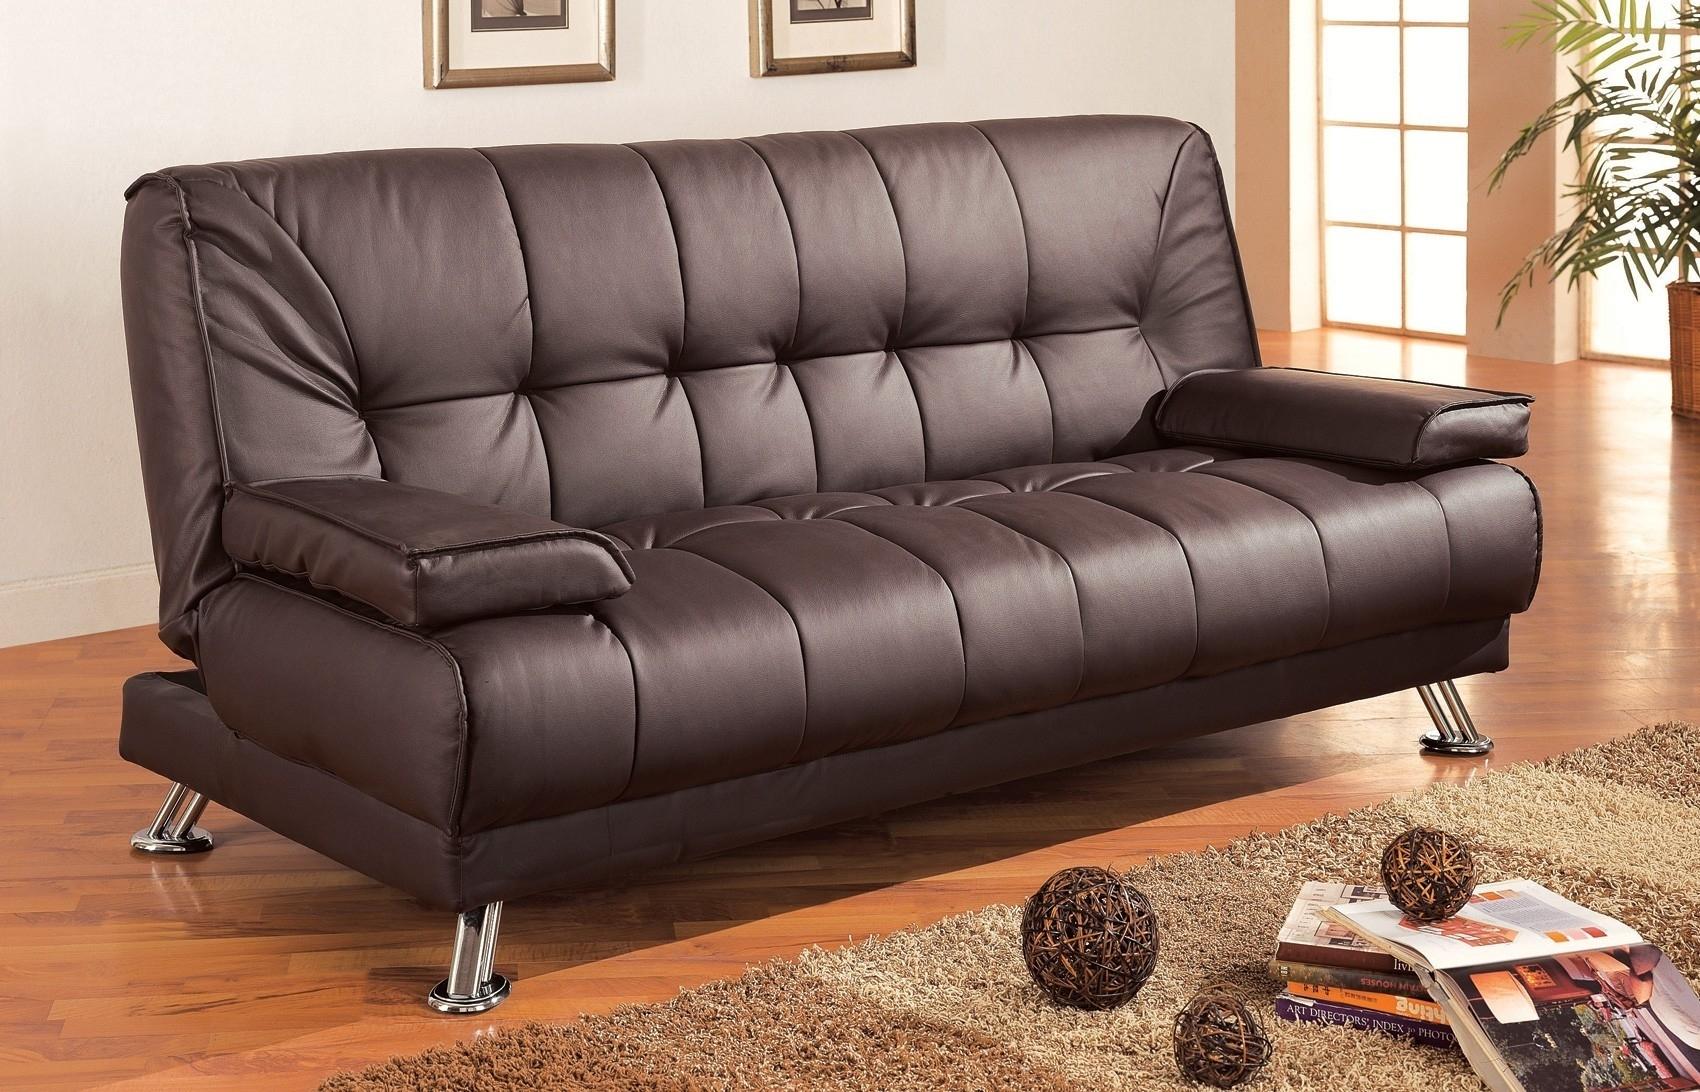 Sofa Beds – Living Room Furniture | Orange County, Ca | Daniel's Inside Orange County Sofas (View 8 of 10)